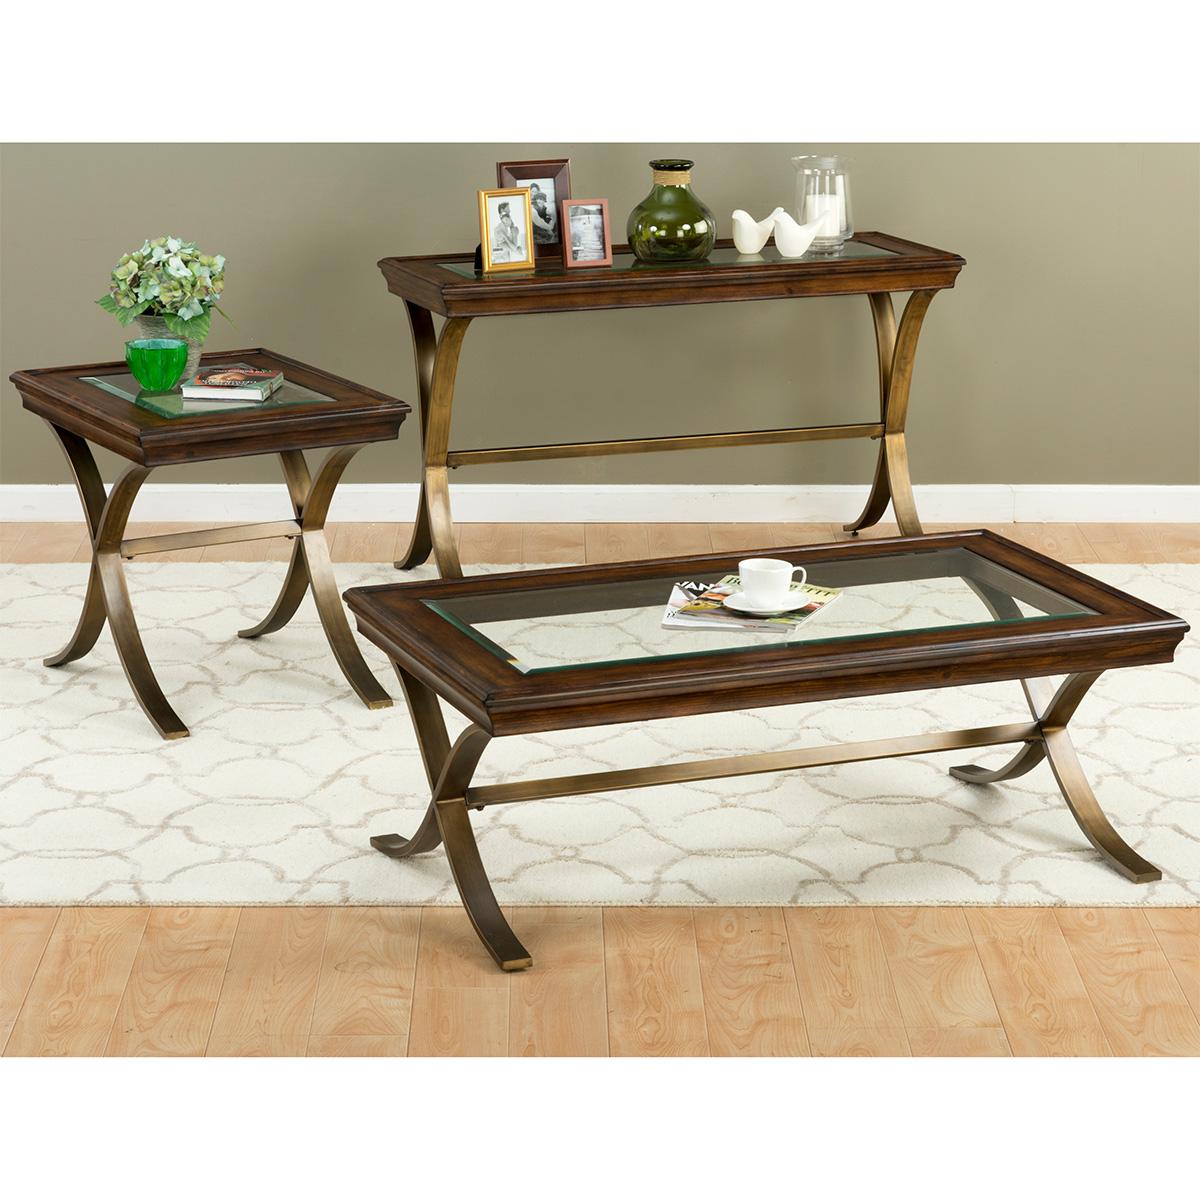 jofran  ashland sofa table w chocolate pine  glass top on  - jofran ashland sofa table w chocolate pine  glass top on curved steel legs